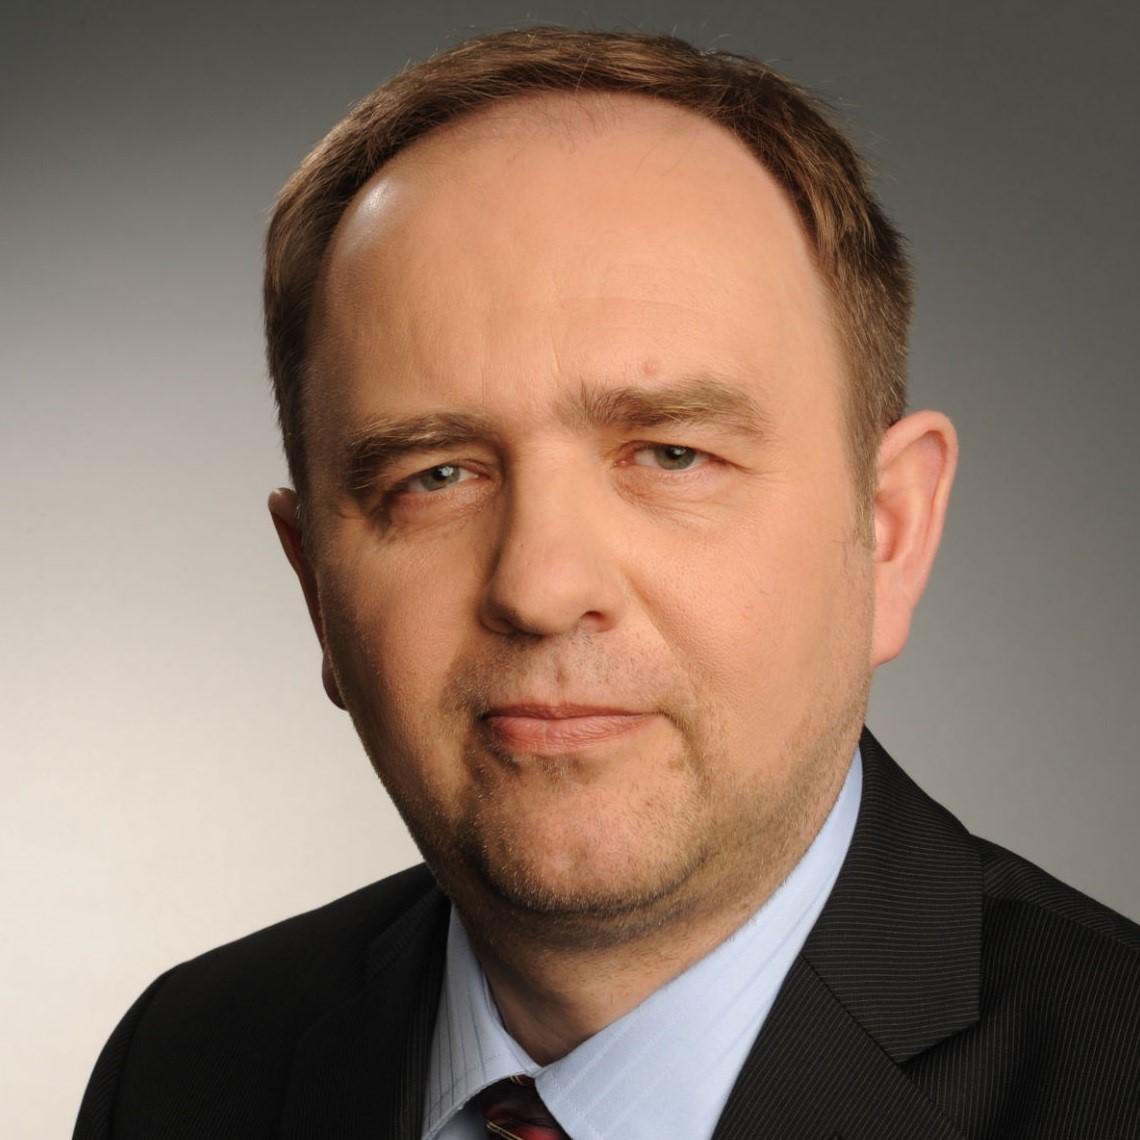 Michał Jaworski